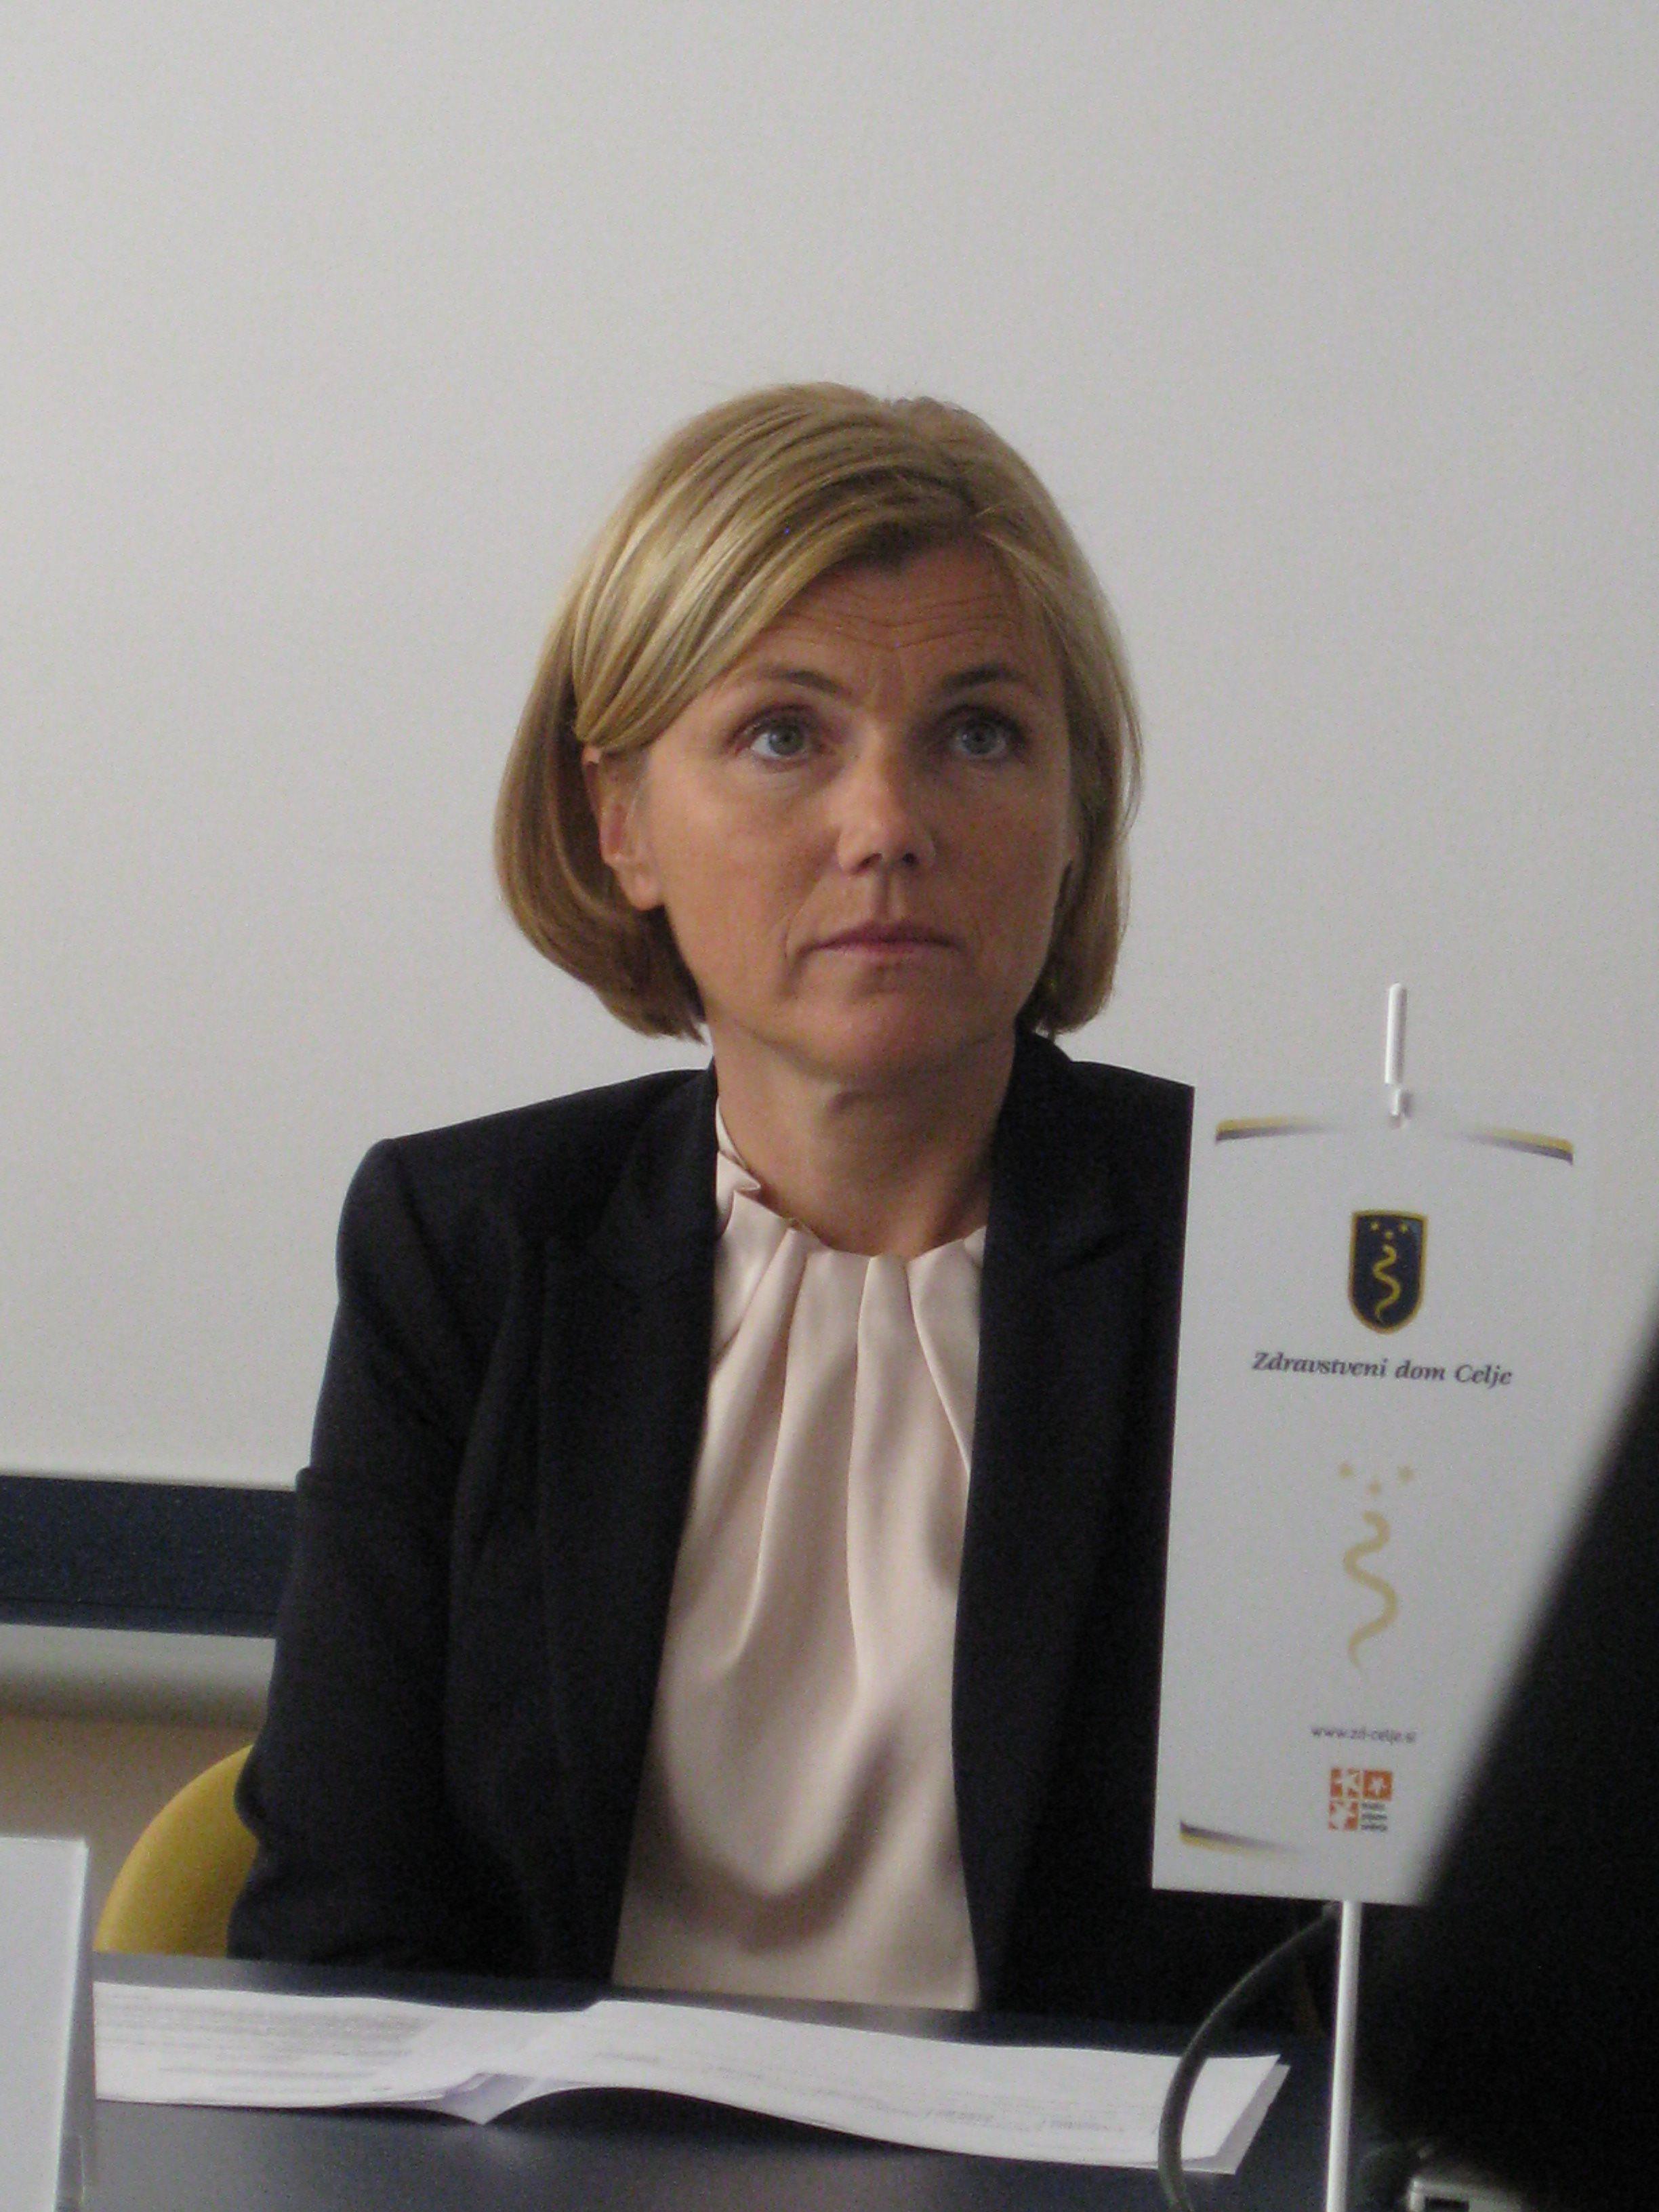 Alenka Obrul